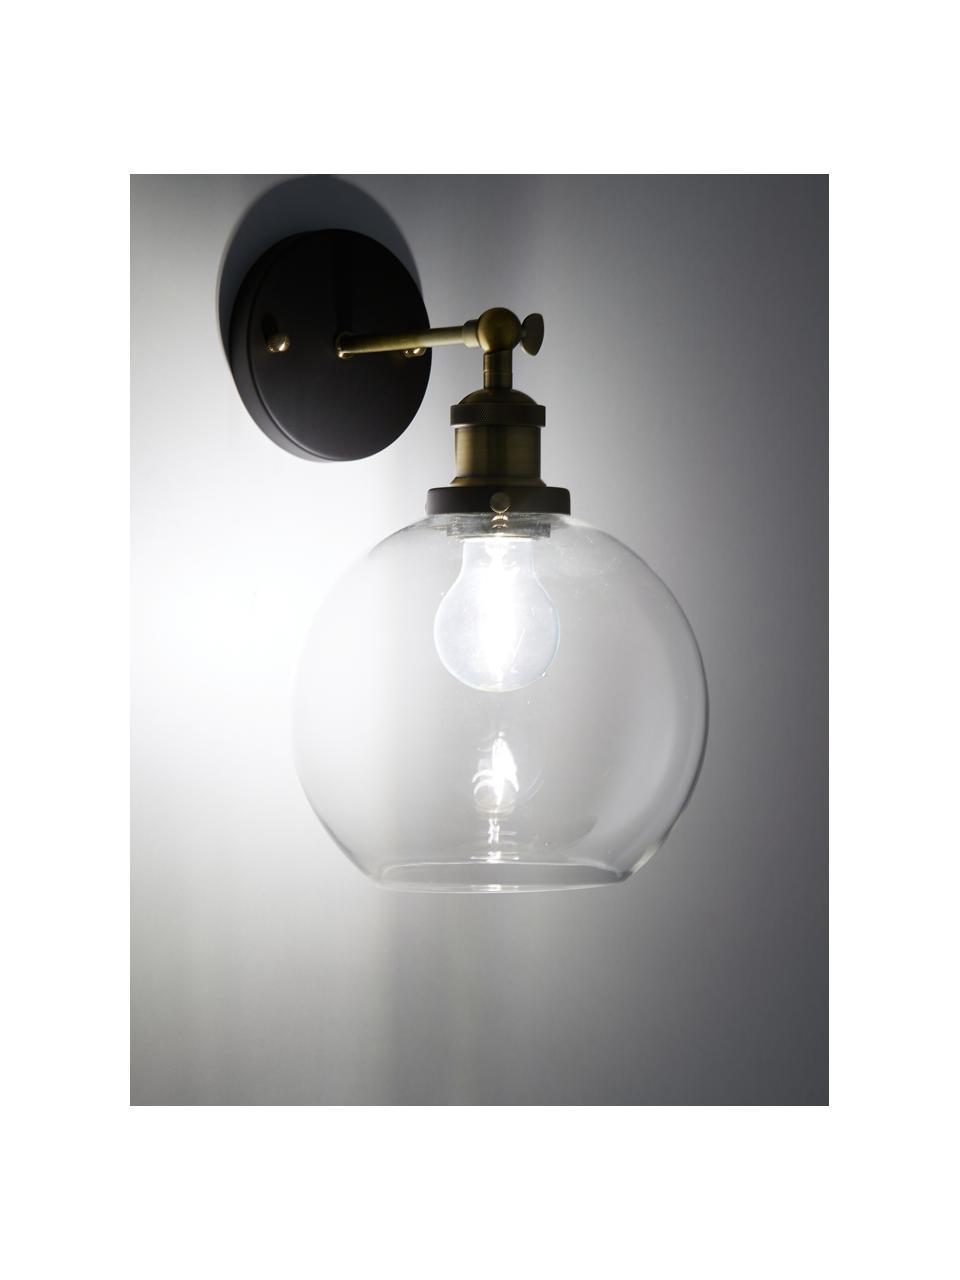 Große Wandleuchte New York Loft No.2, Lampenschirm: Glas, Gestell: Messing, Schwarz, Messing, Transparent, 20 x 35 cm